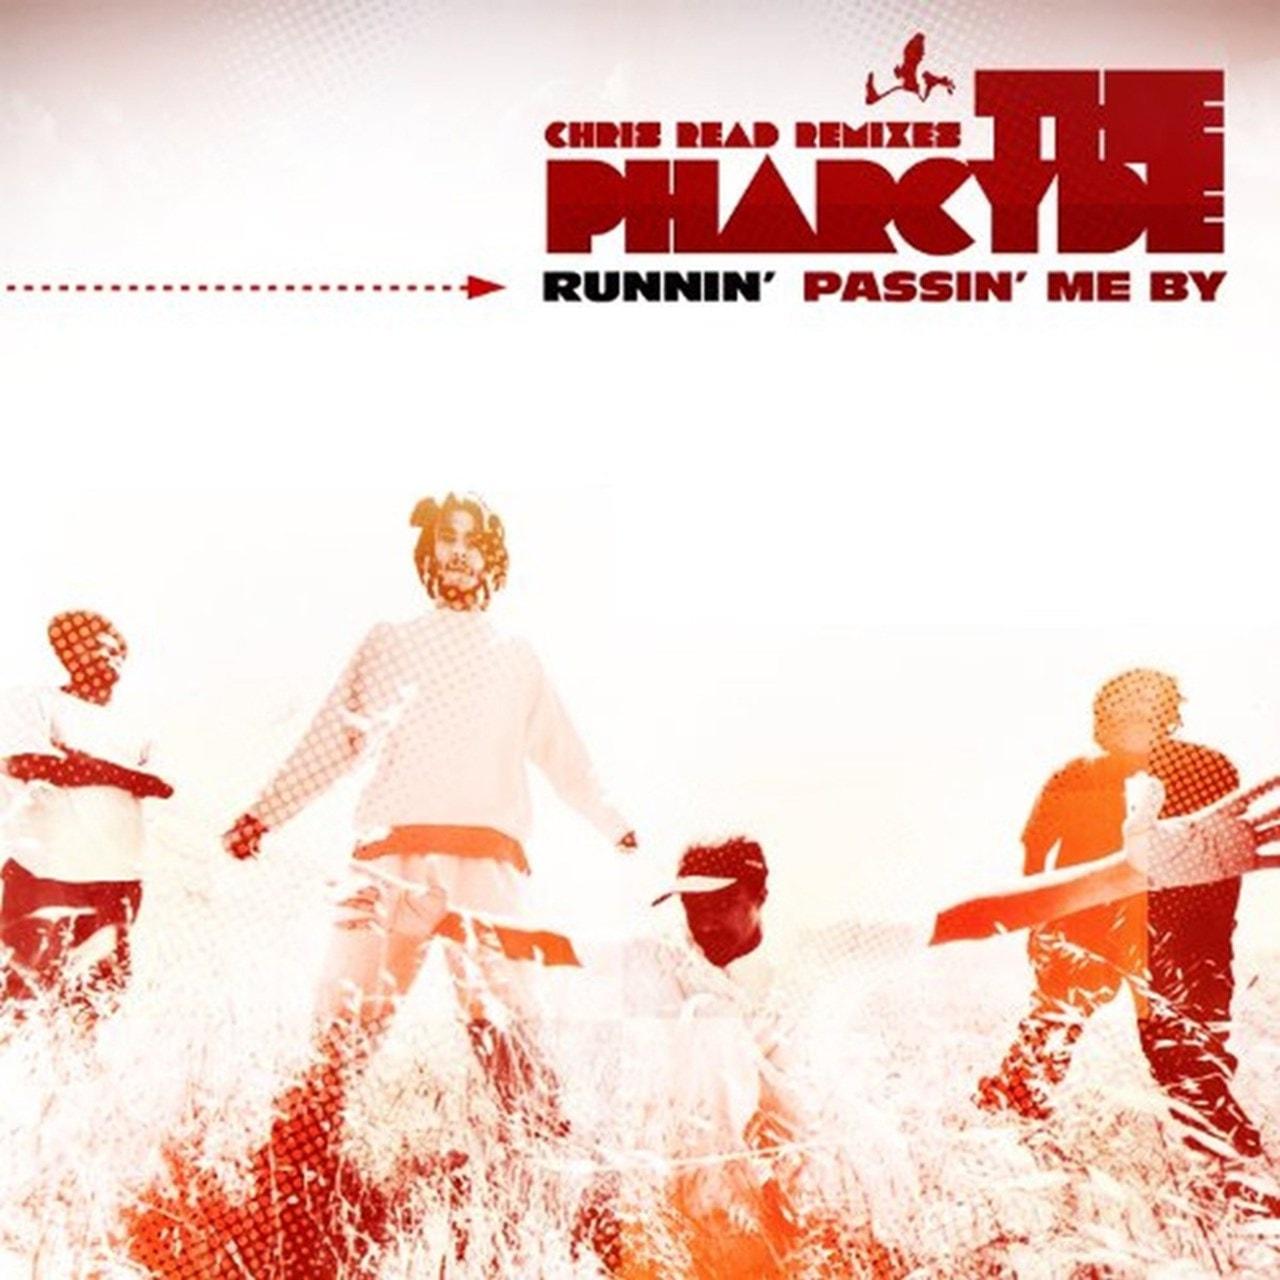 Runnin'/Passin' Me By: Chris Read Remixes - 1